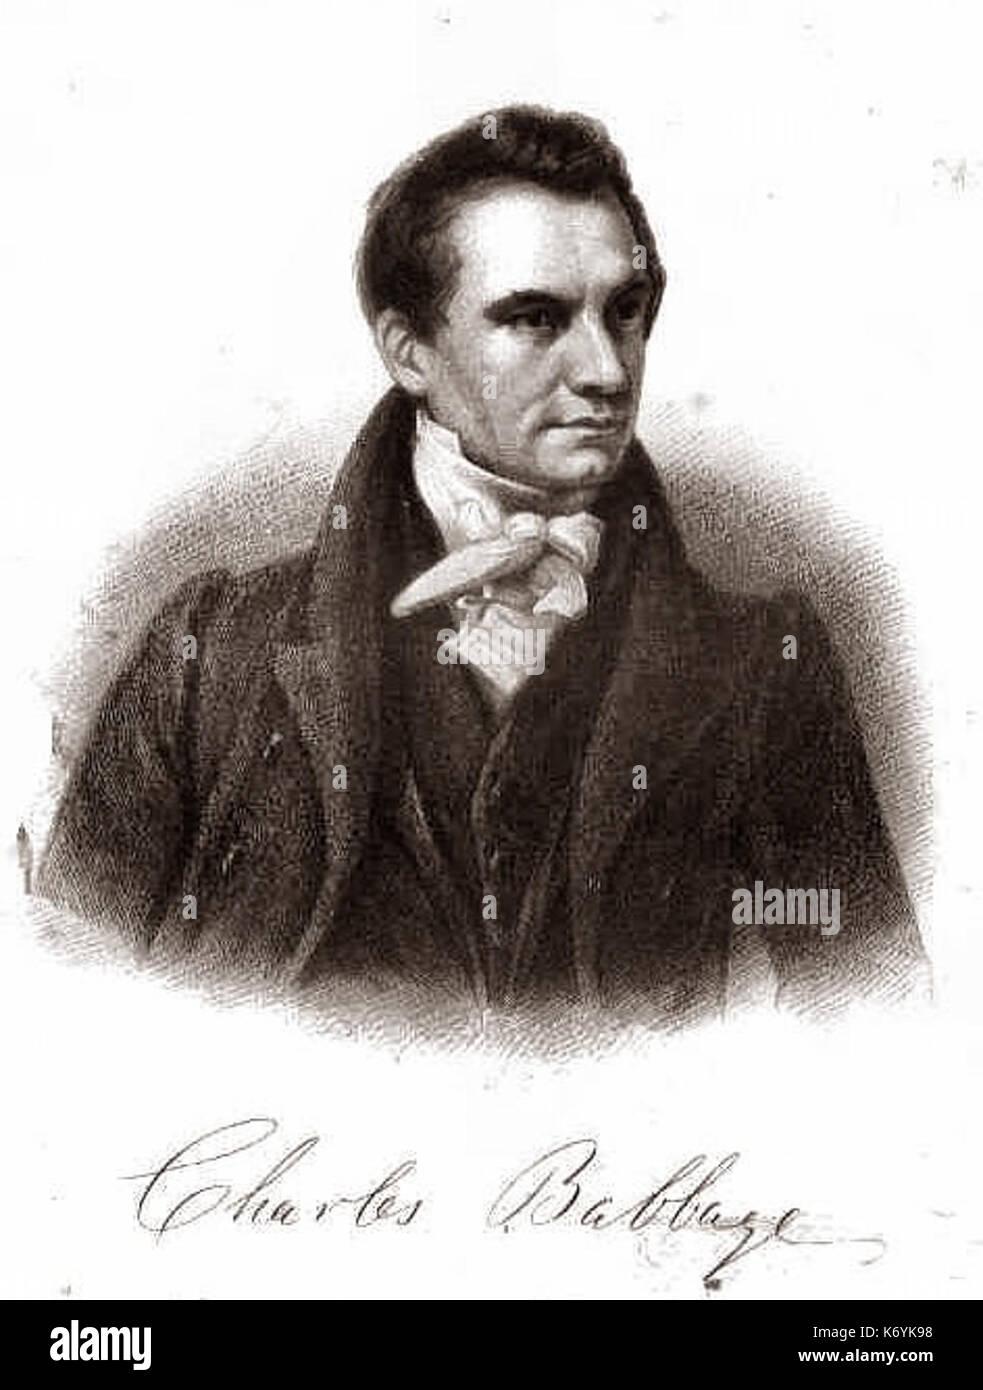 Engaving of Charles Babbage from Mechanics Magazine - Stock Image